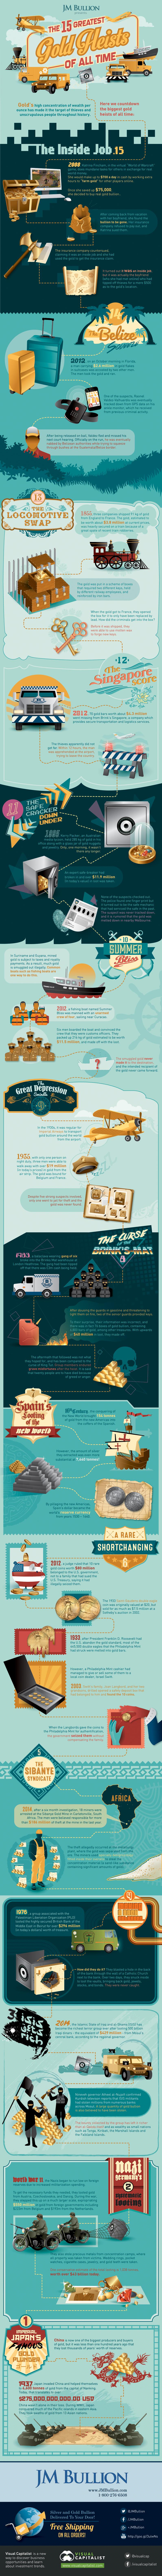 Infografia robos oro mas importantes